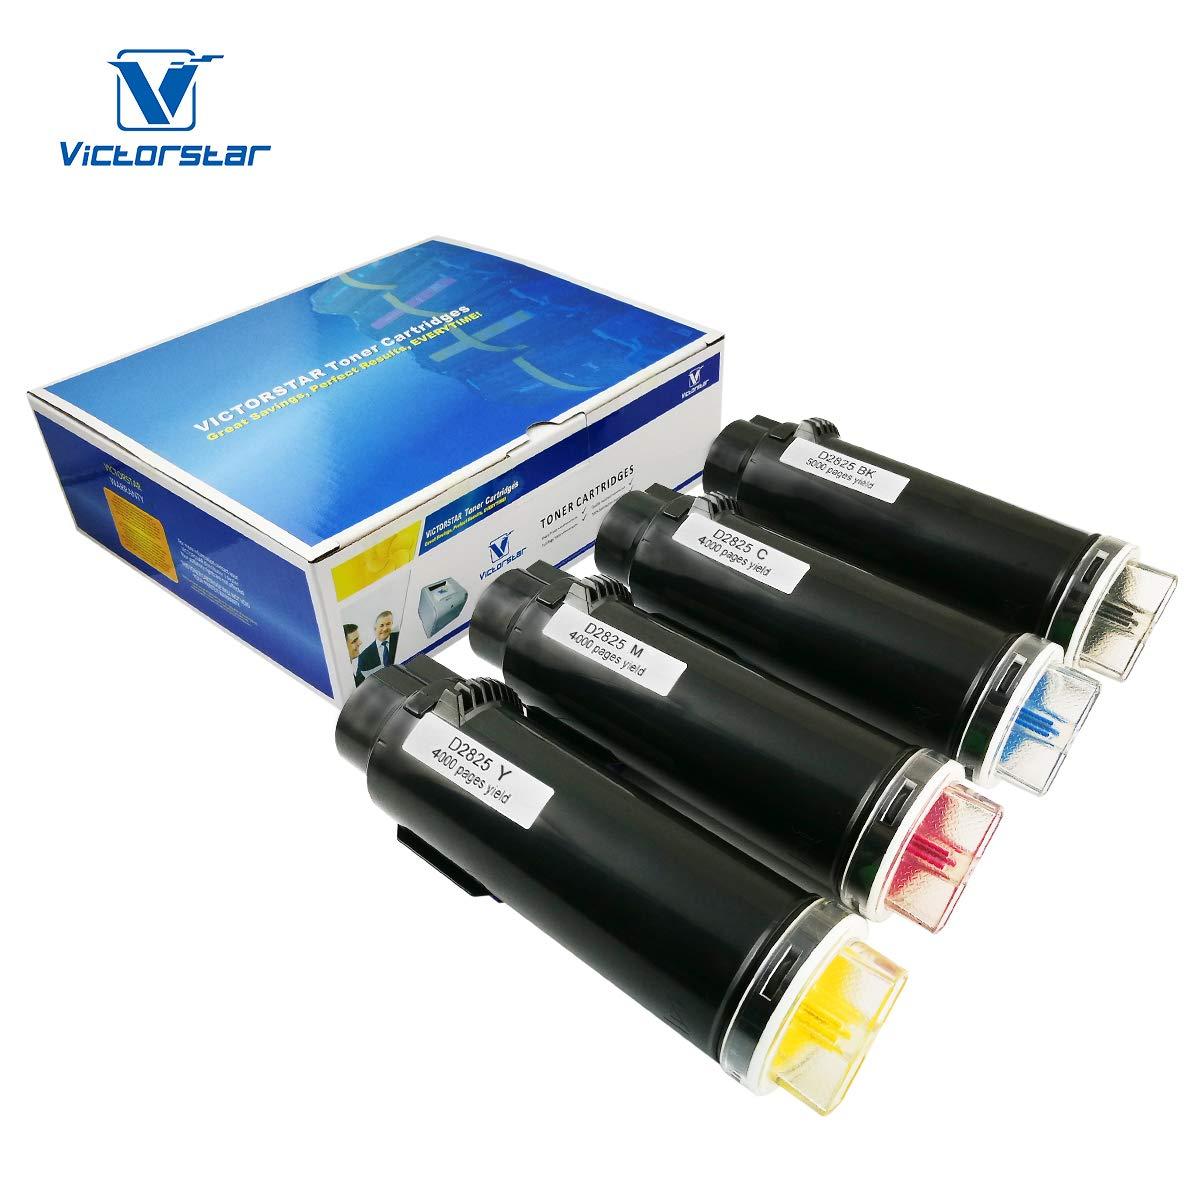 Toner Alternativo ( X4 ) Alta Capacidad 4 Colores S2825cd...